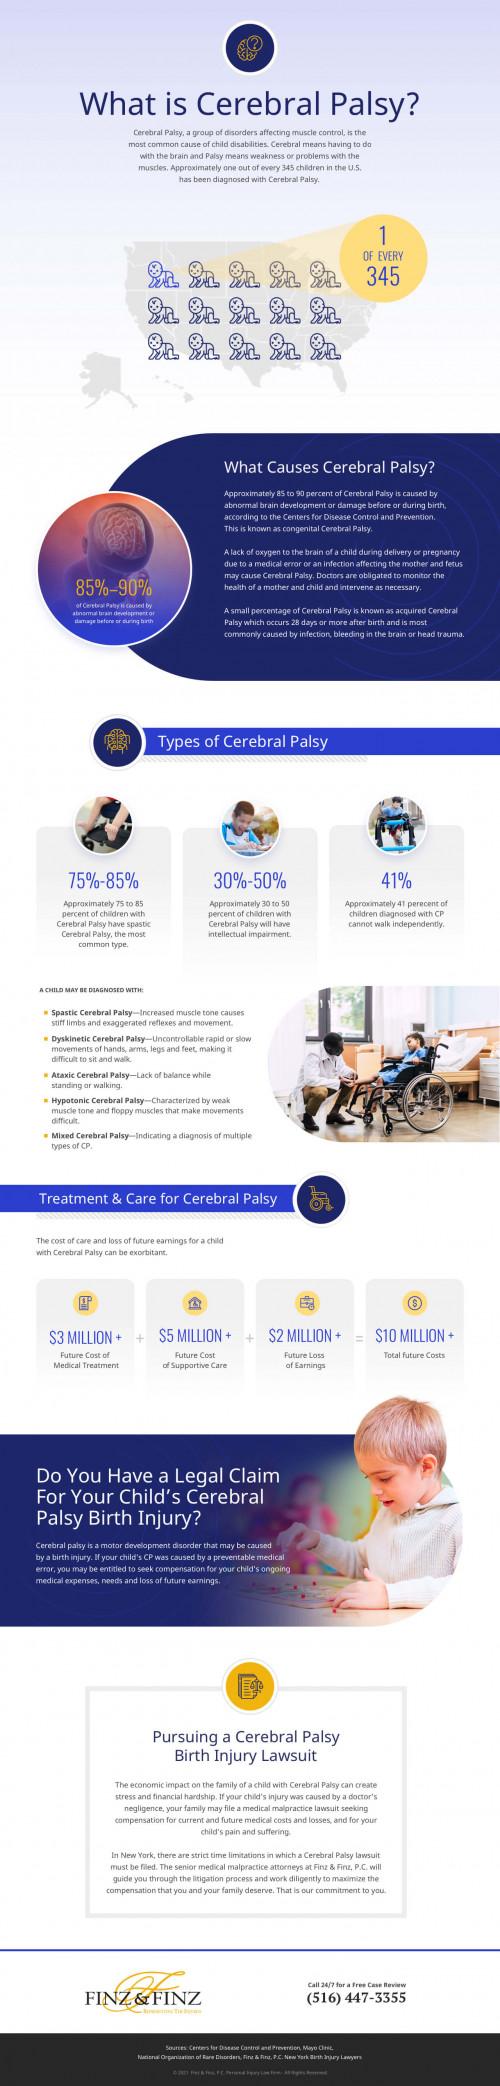 Cerebral-Palsy-Birth-Injury-Infographic-FinzFinz.jpg